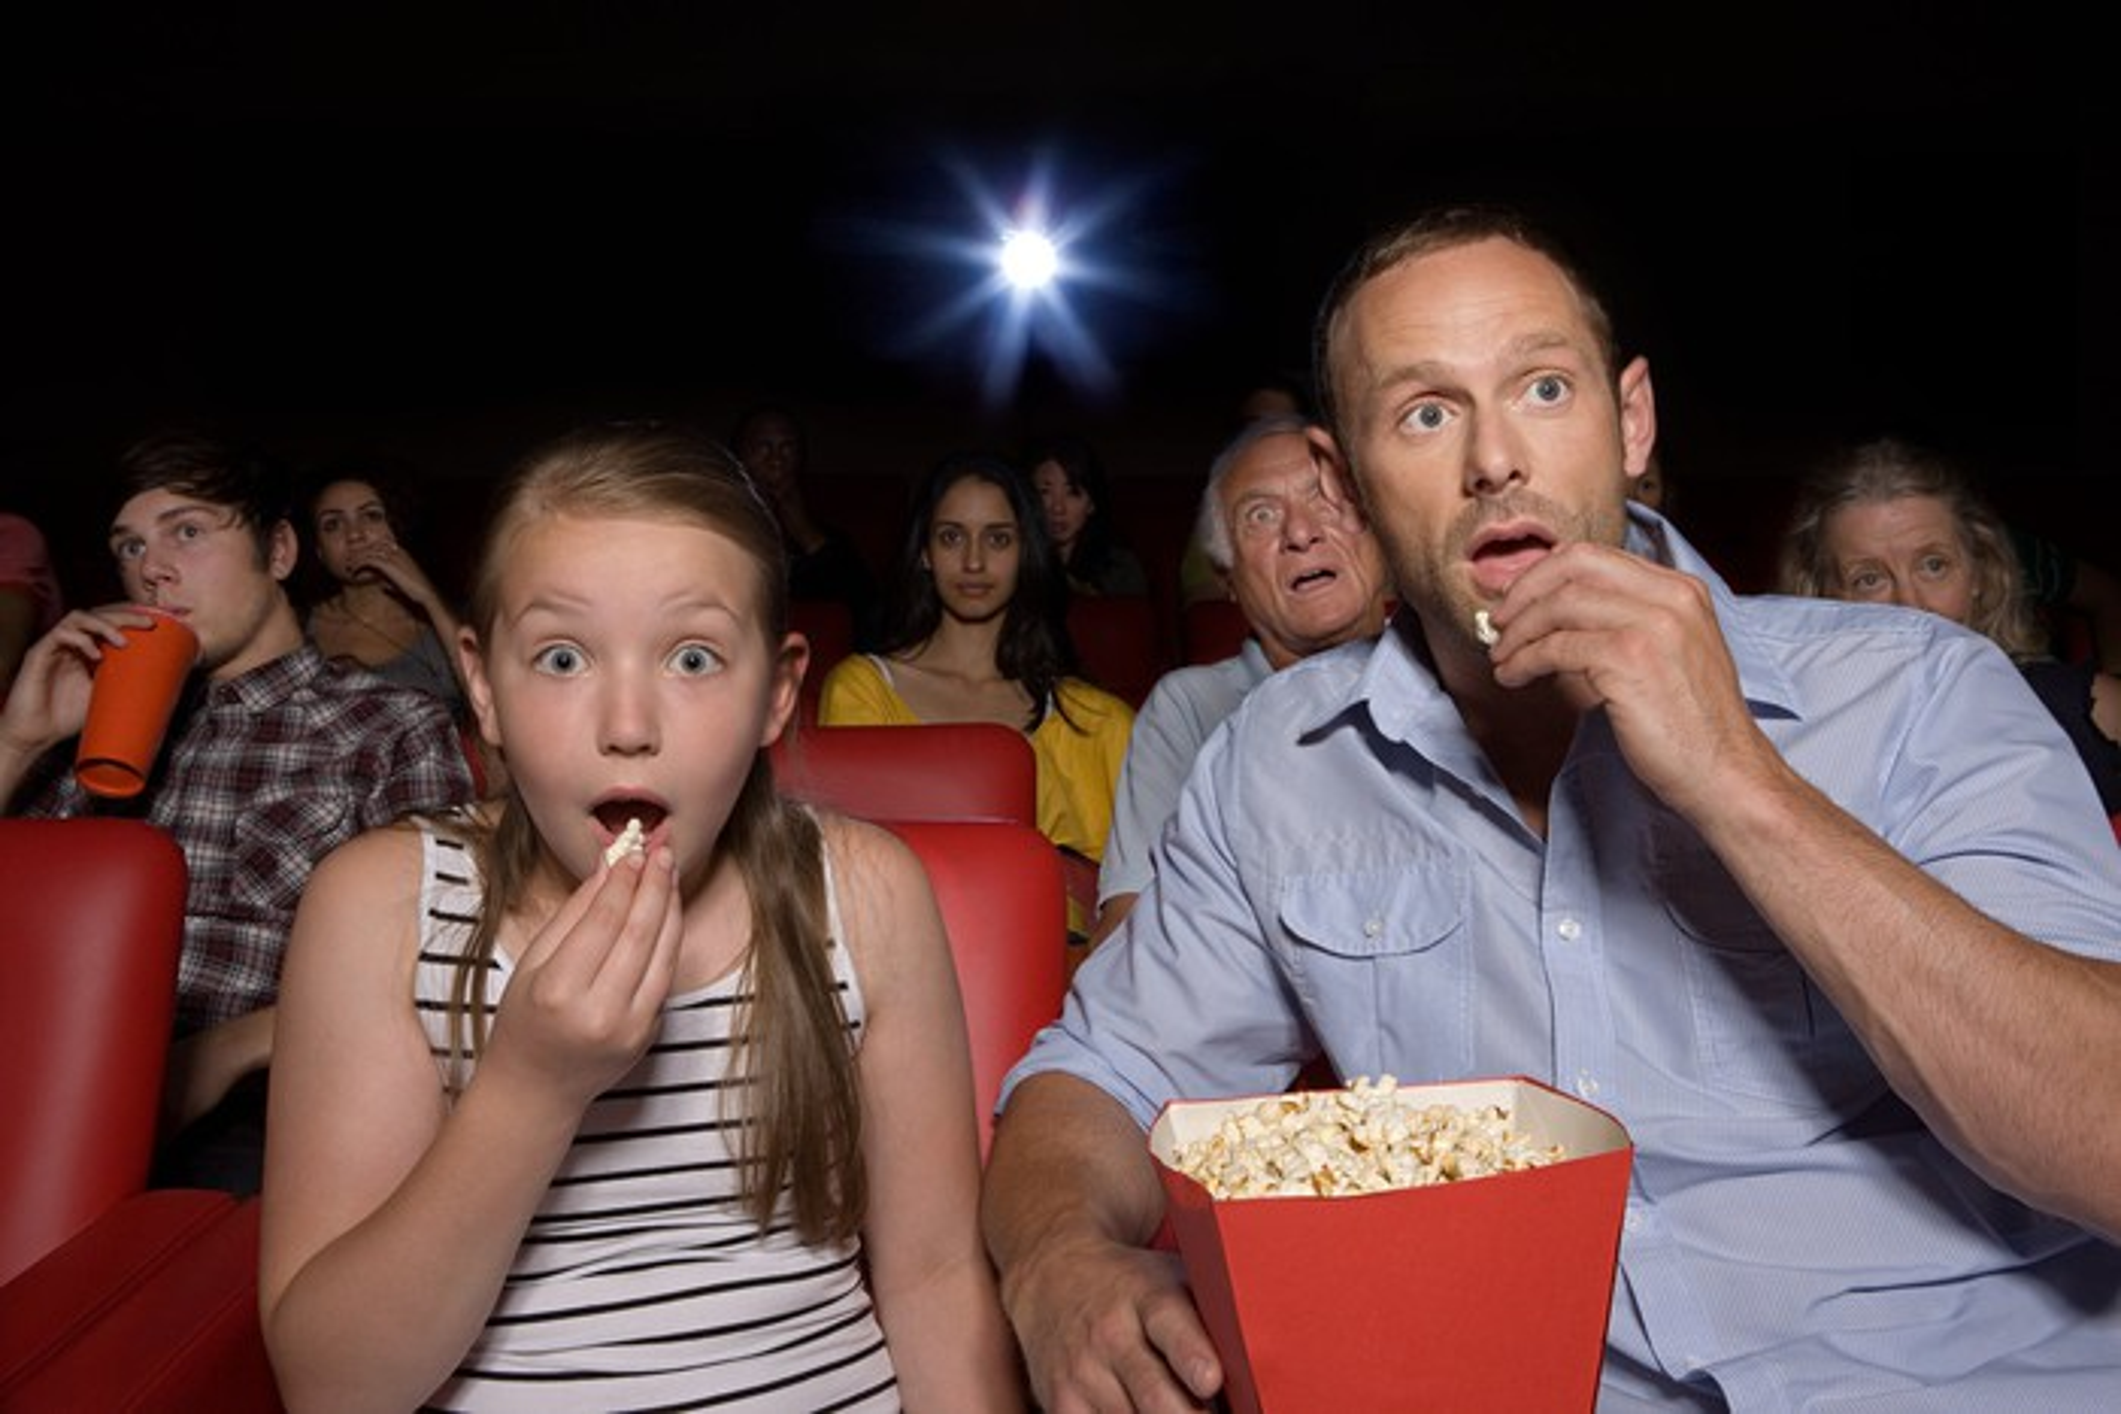 Movie watchers eating popcorn